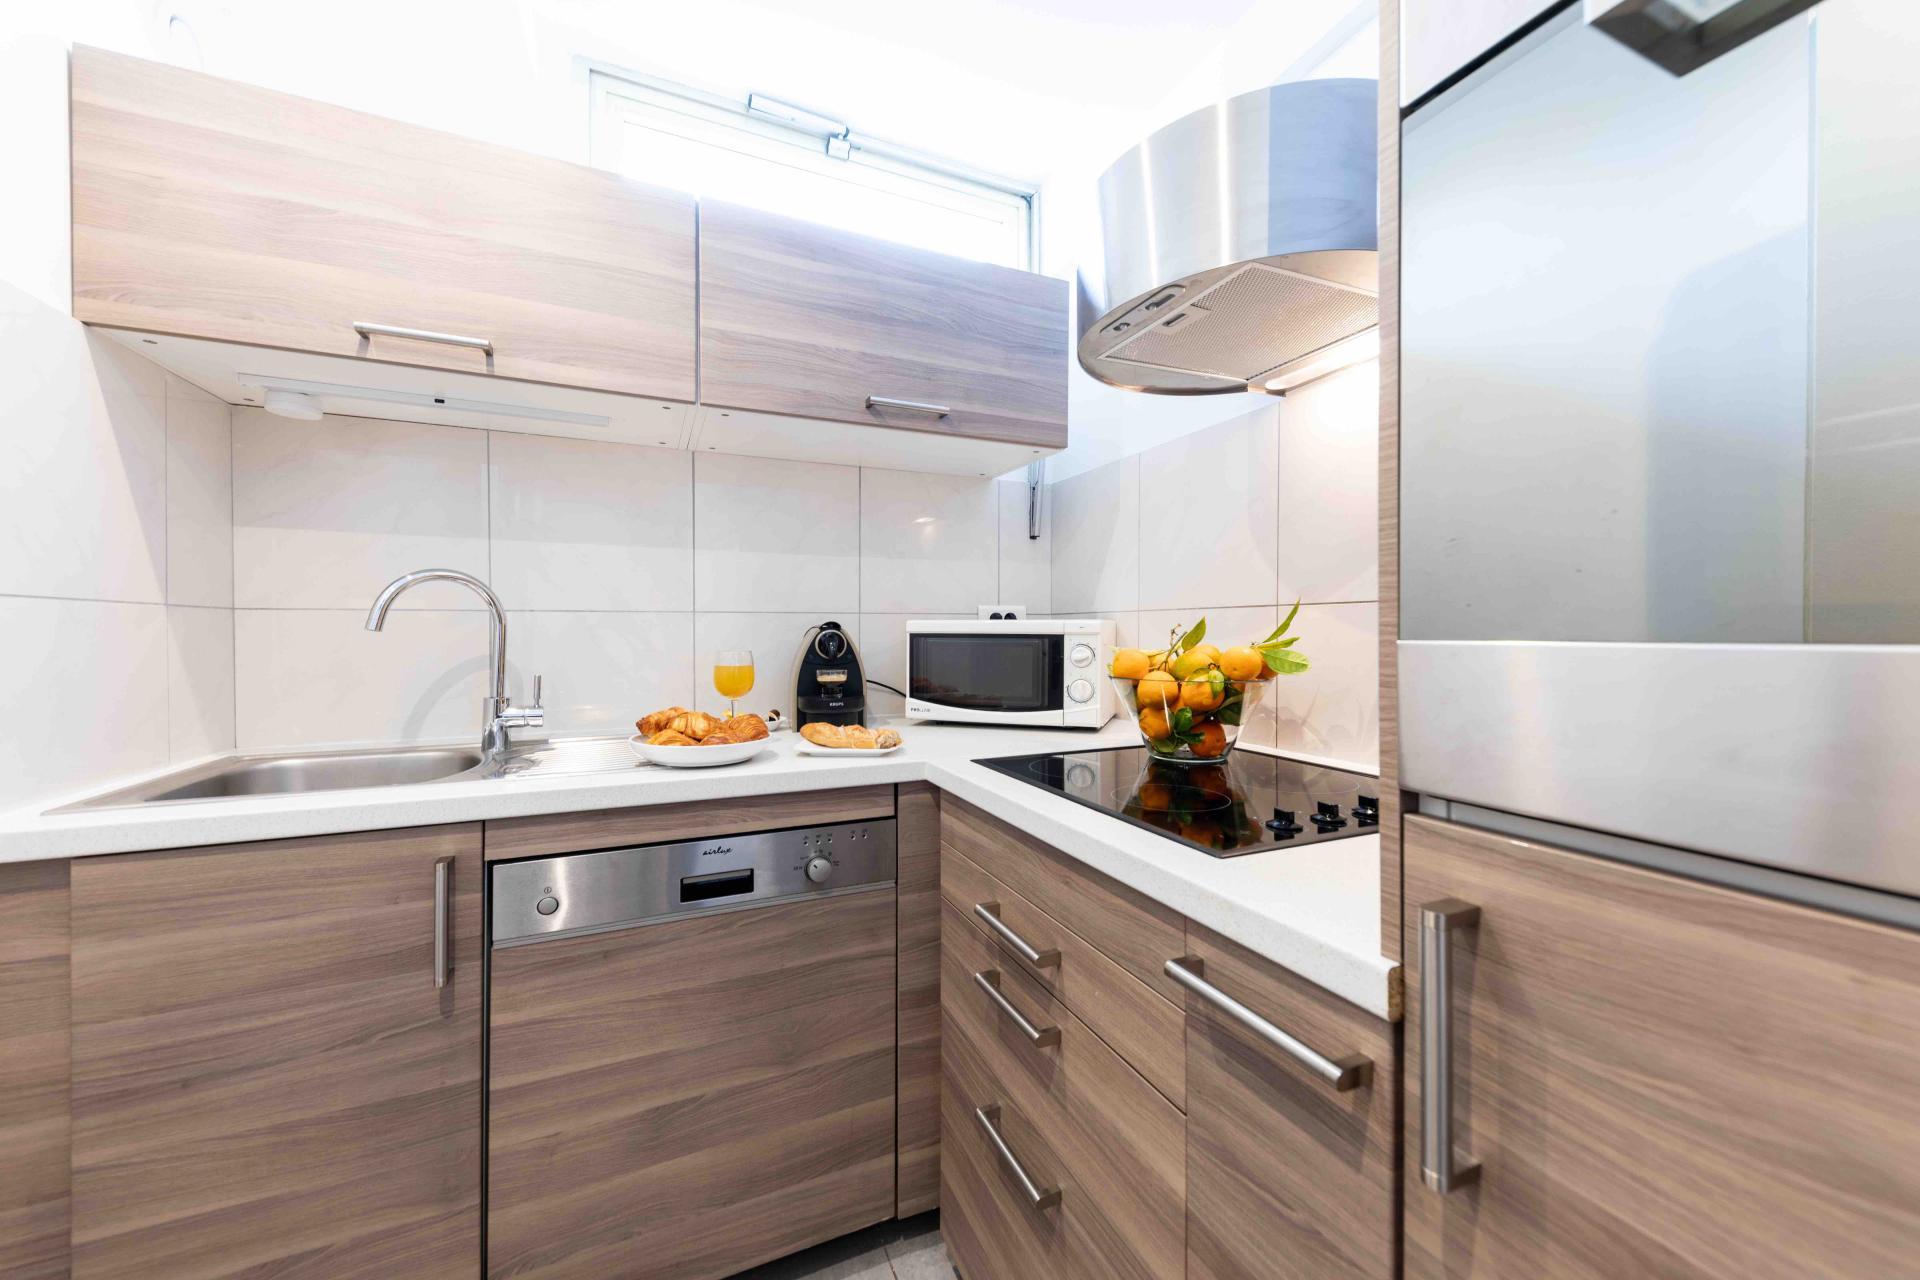 Kitchen at Avenue Alexandre Apartments, Juan-les-Pins, Antibes